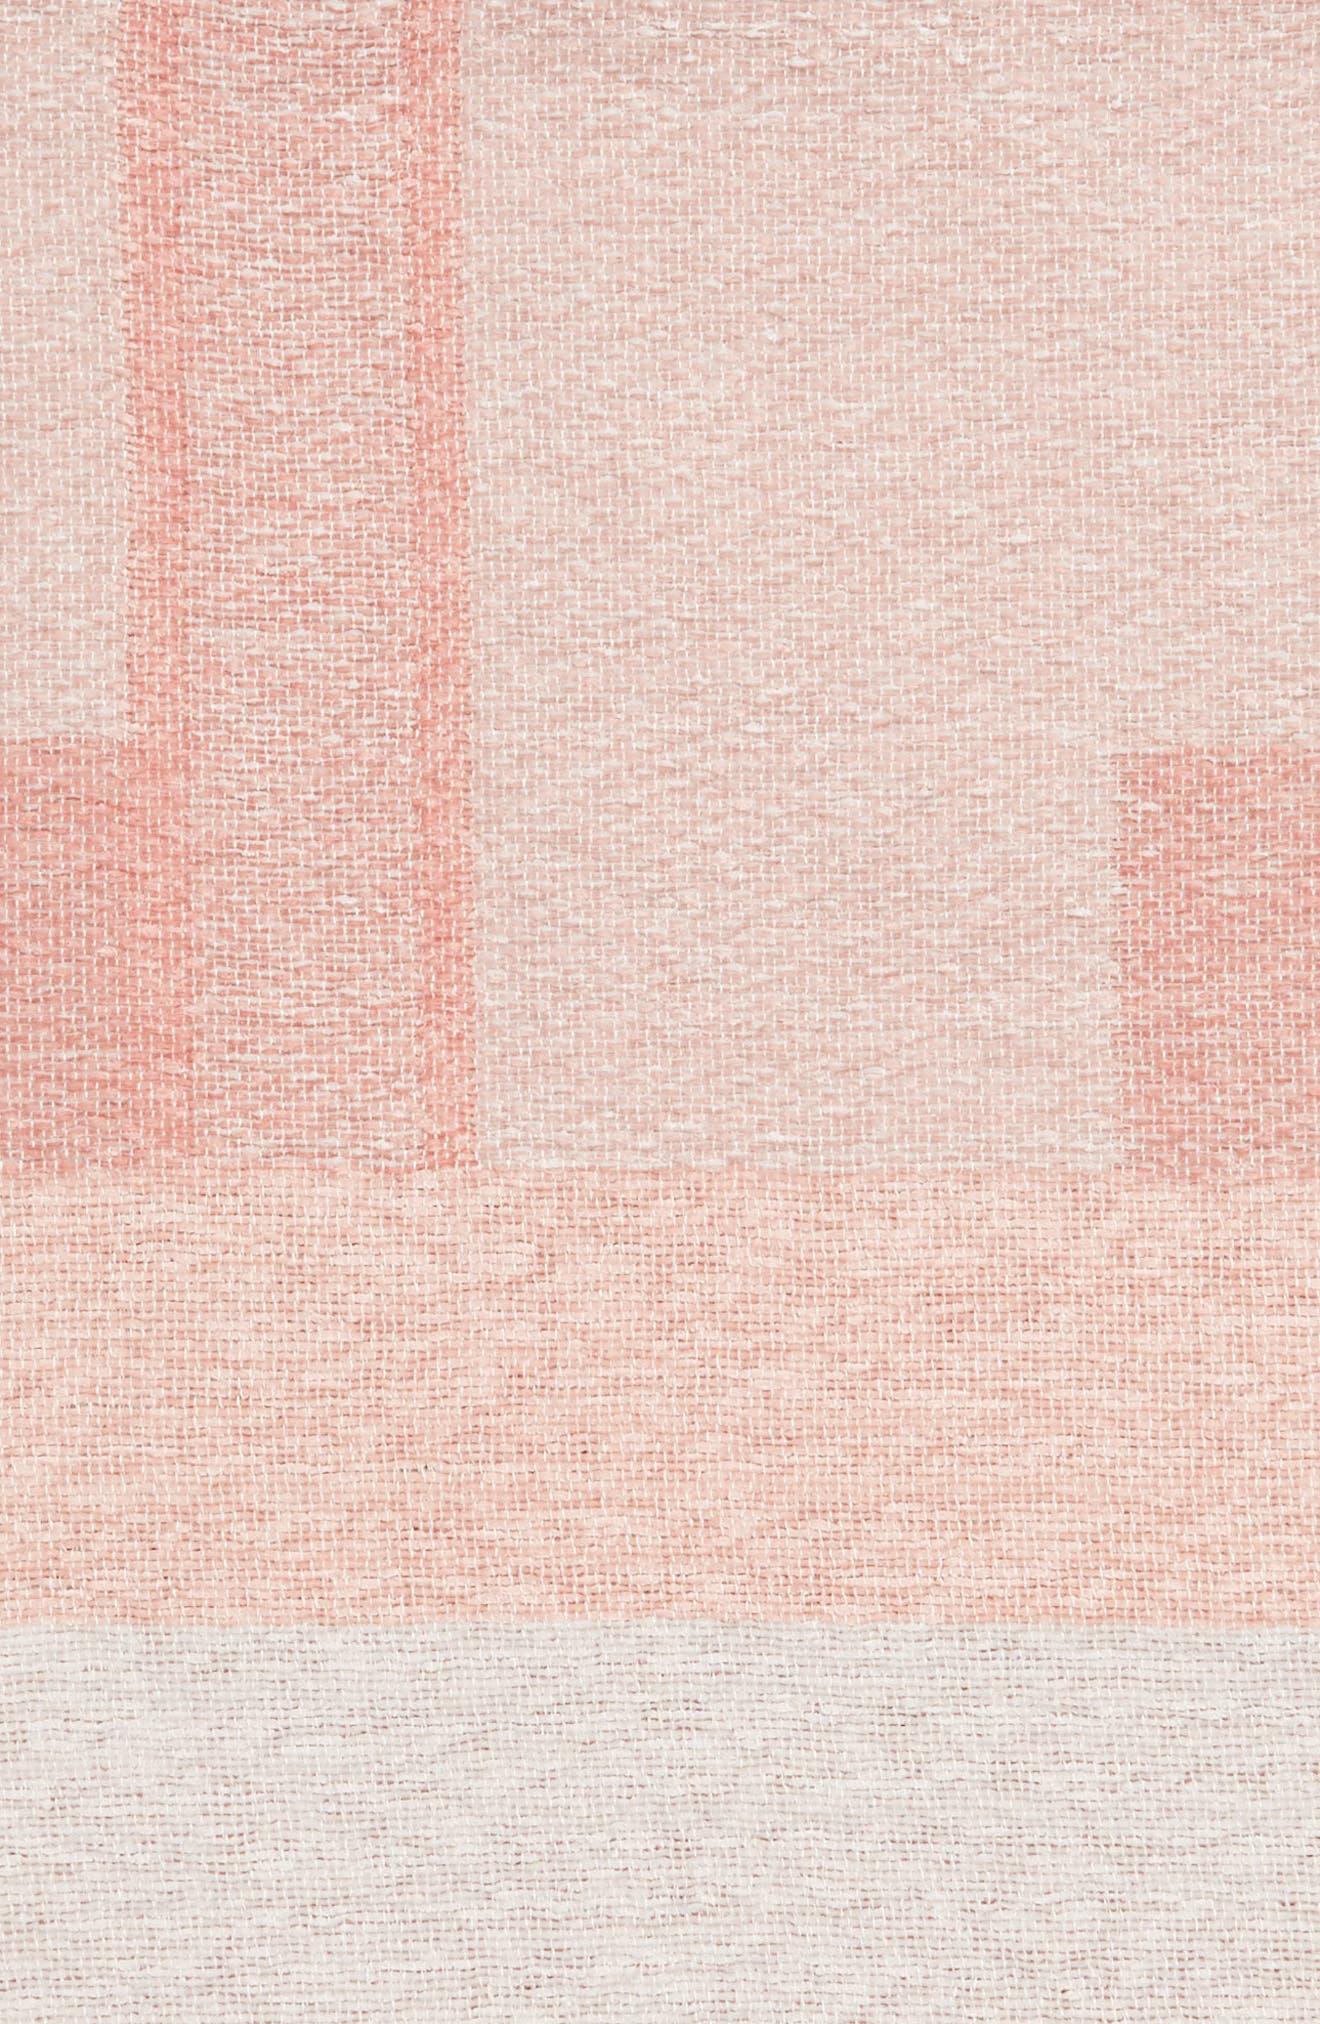 Geo Throw Blanket,                             Alternate thumbnail 2, color,                             PINK MISTY MULTI